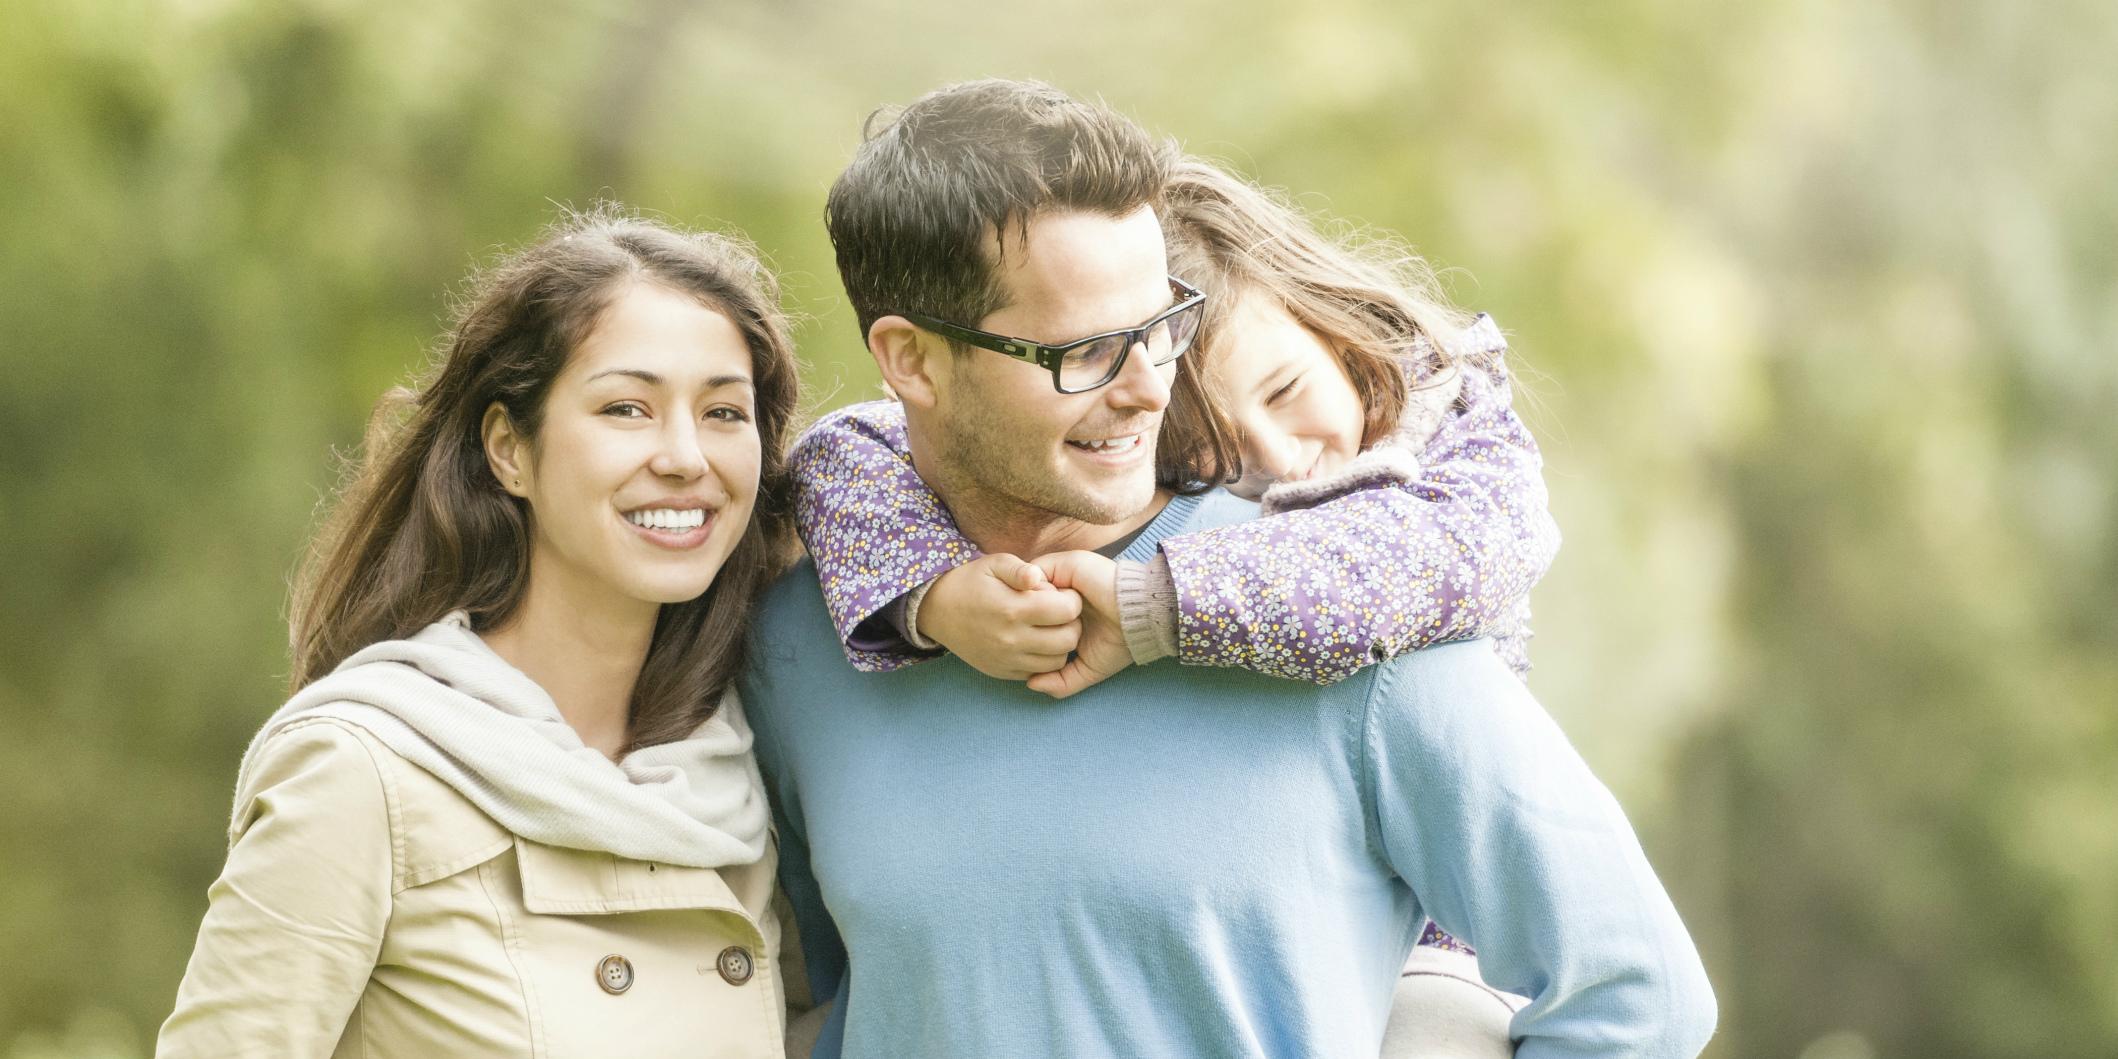 PrimaryCare_FamilyPlanningAndBirthControl_web_600x300_177866193_v2